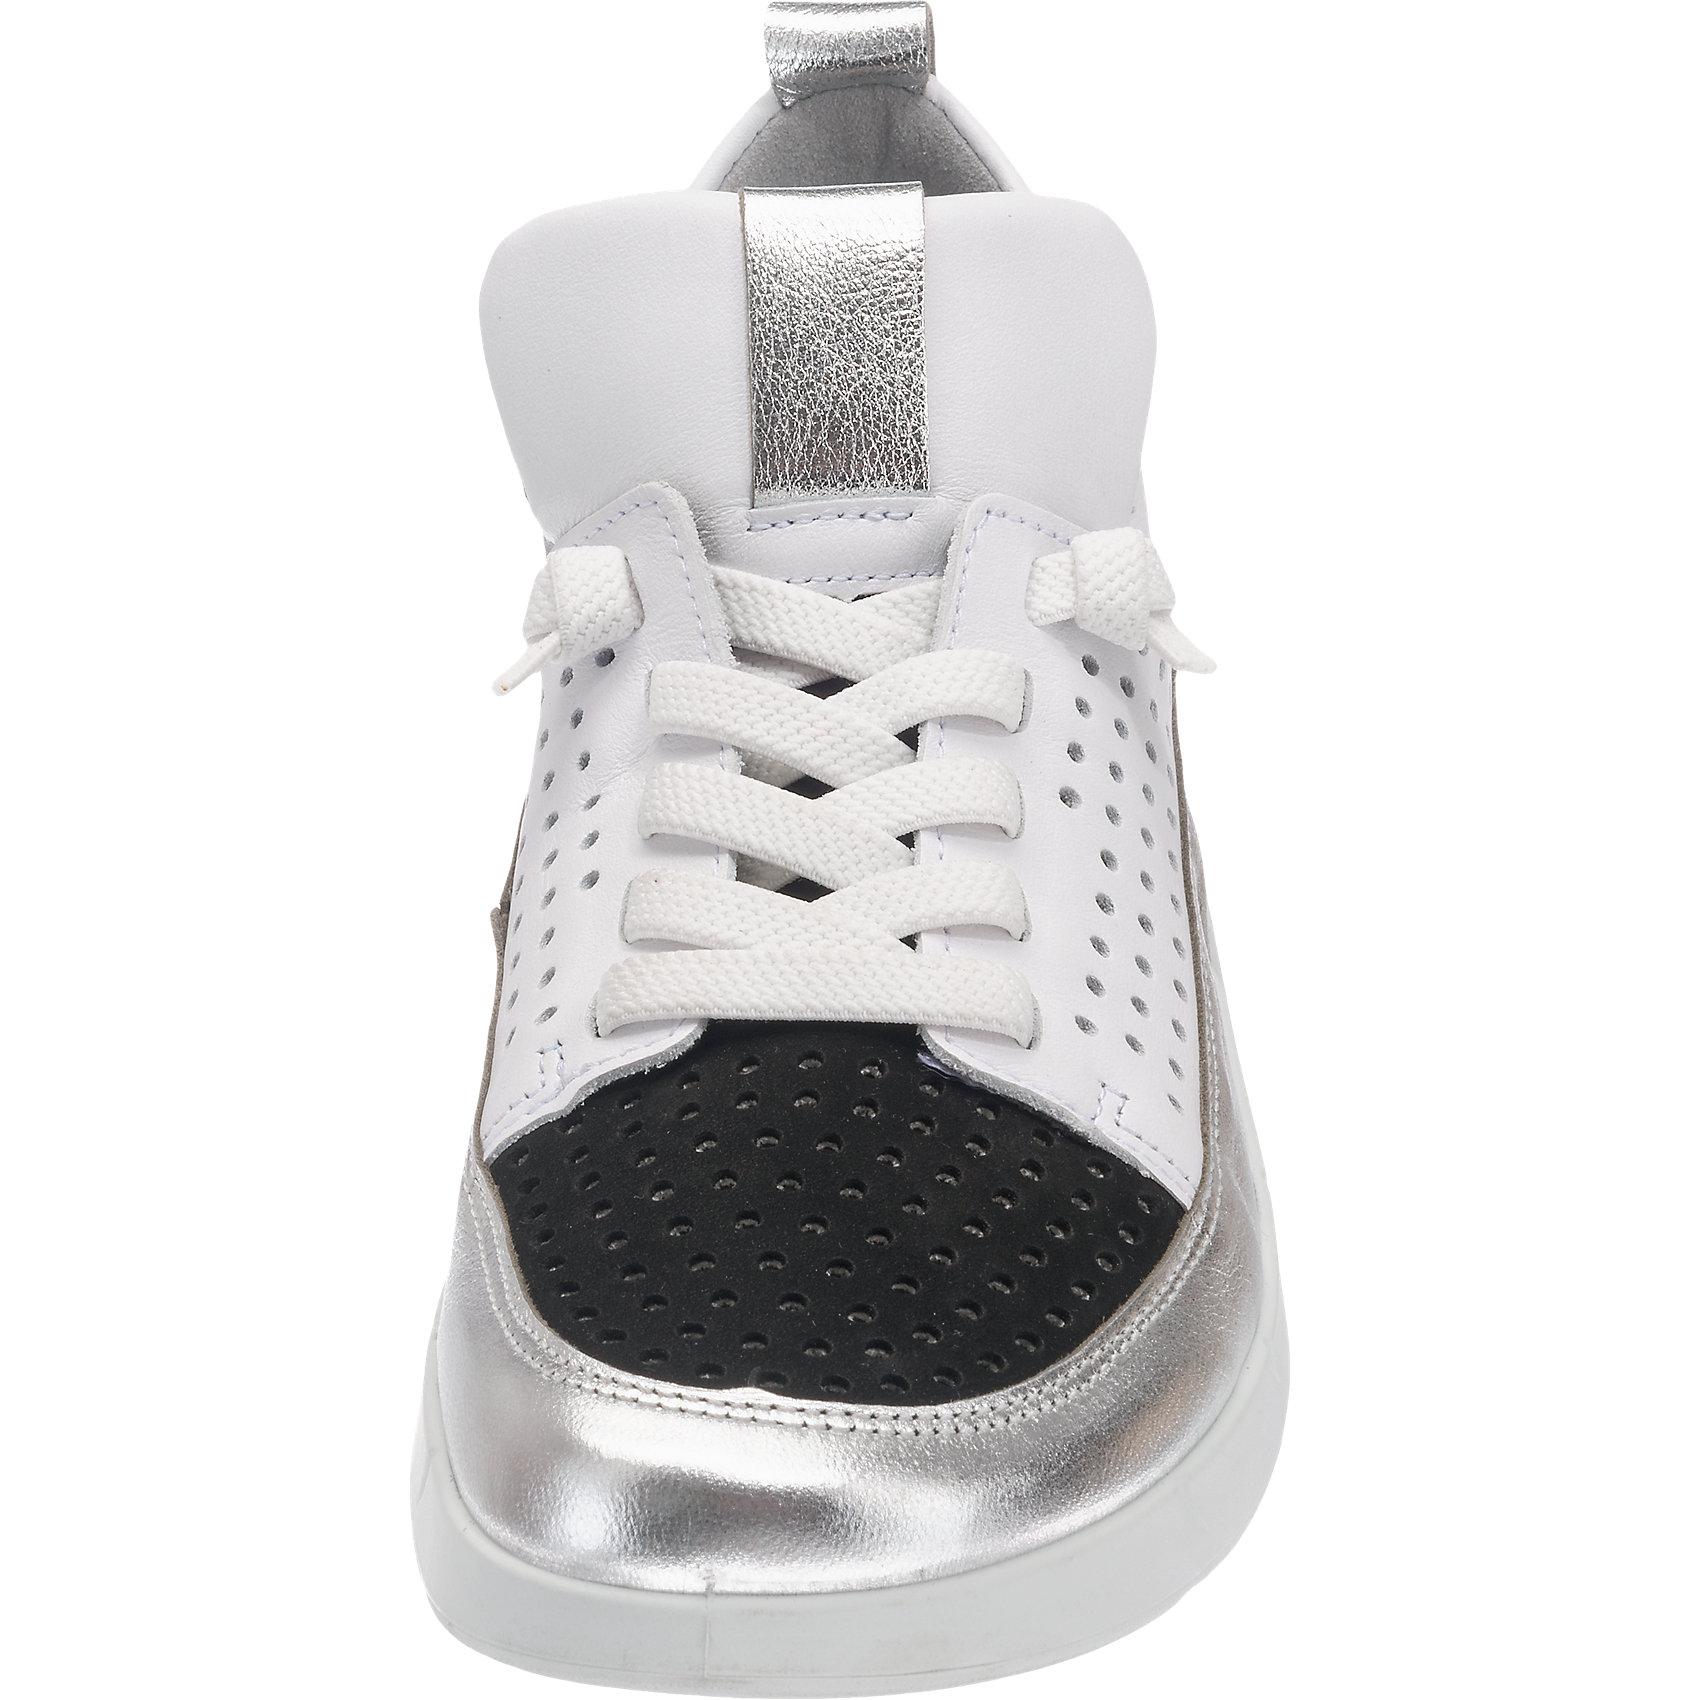 Neu ara Kopenhagen Sneakers weiß-kombi 5767150 5767150 weiß-kombi 5e67a0